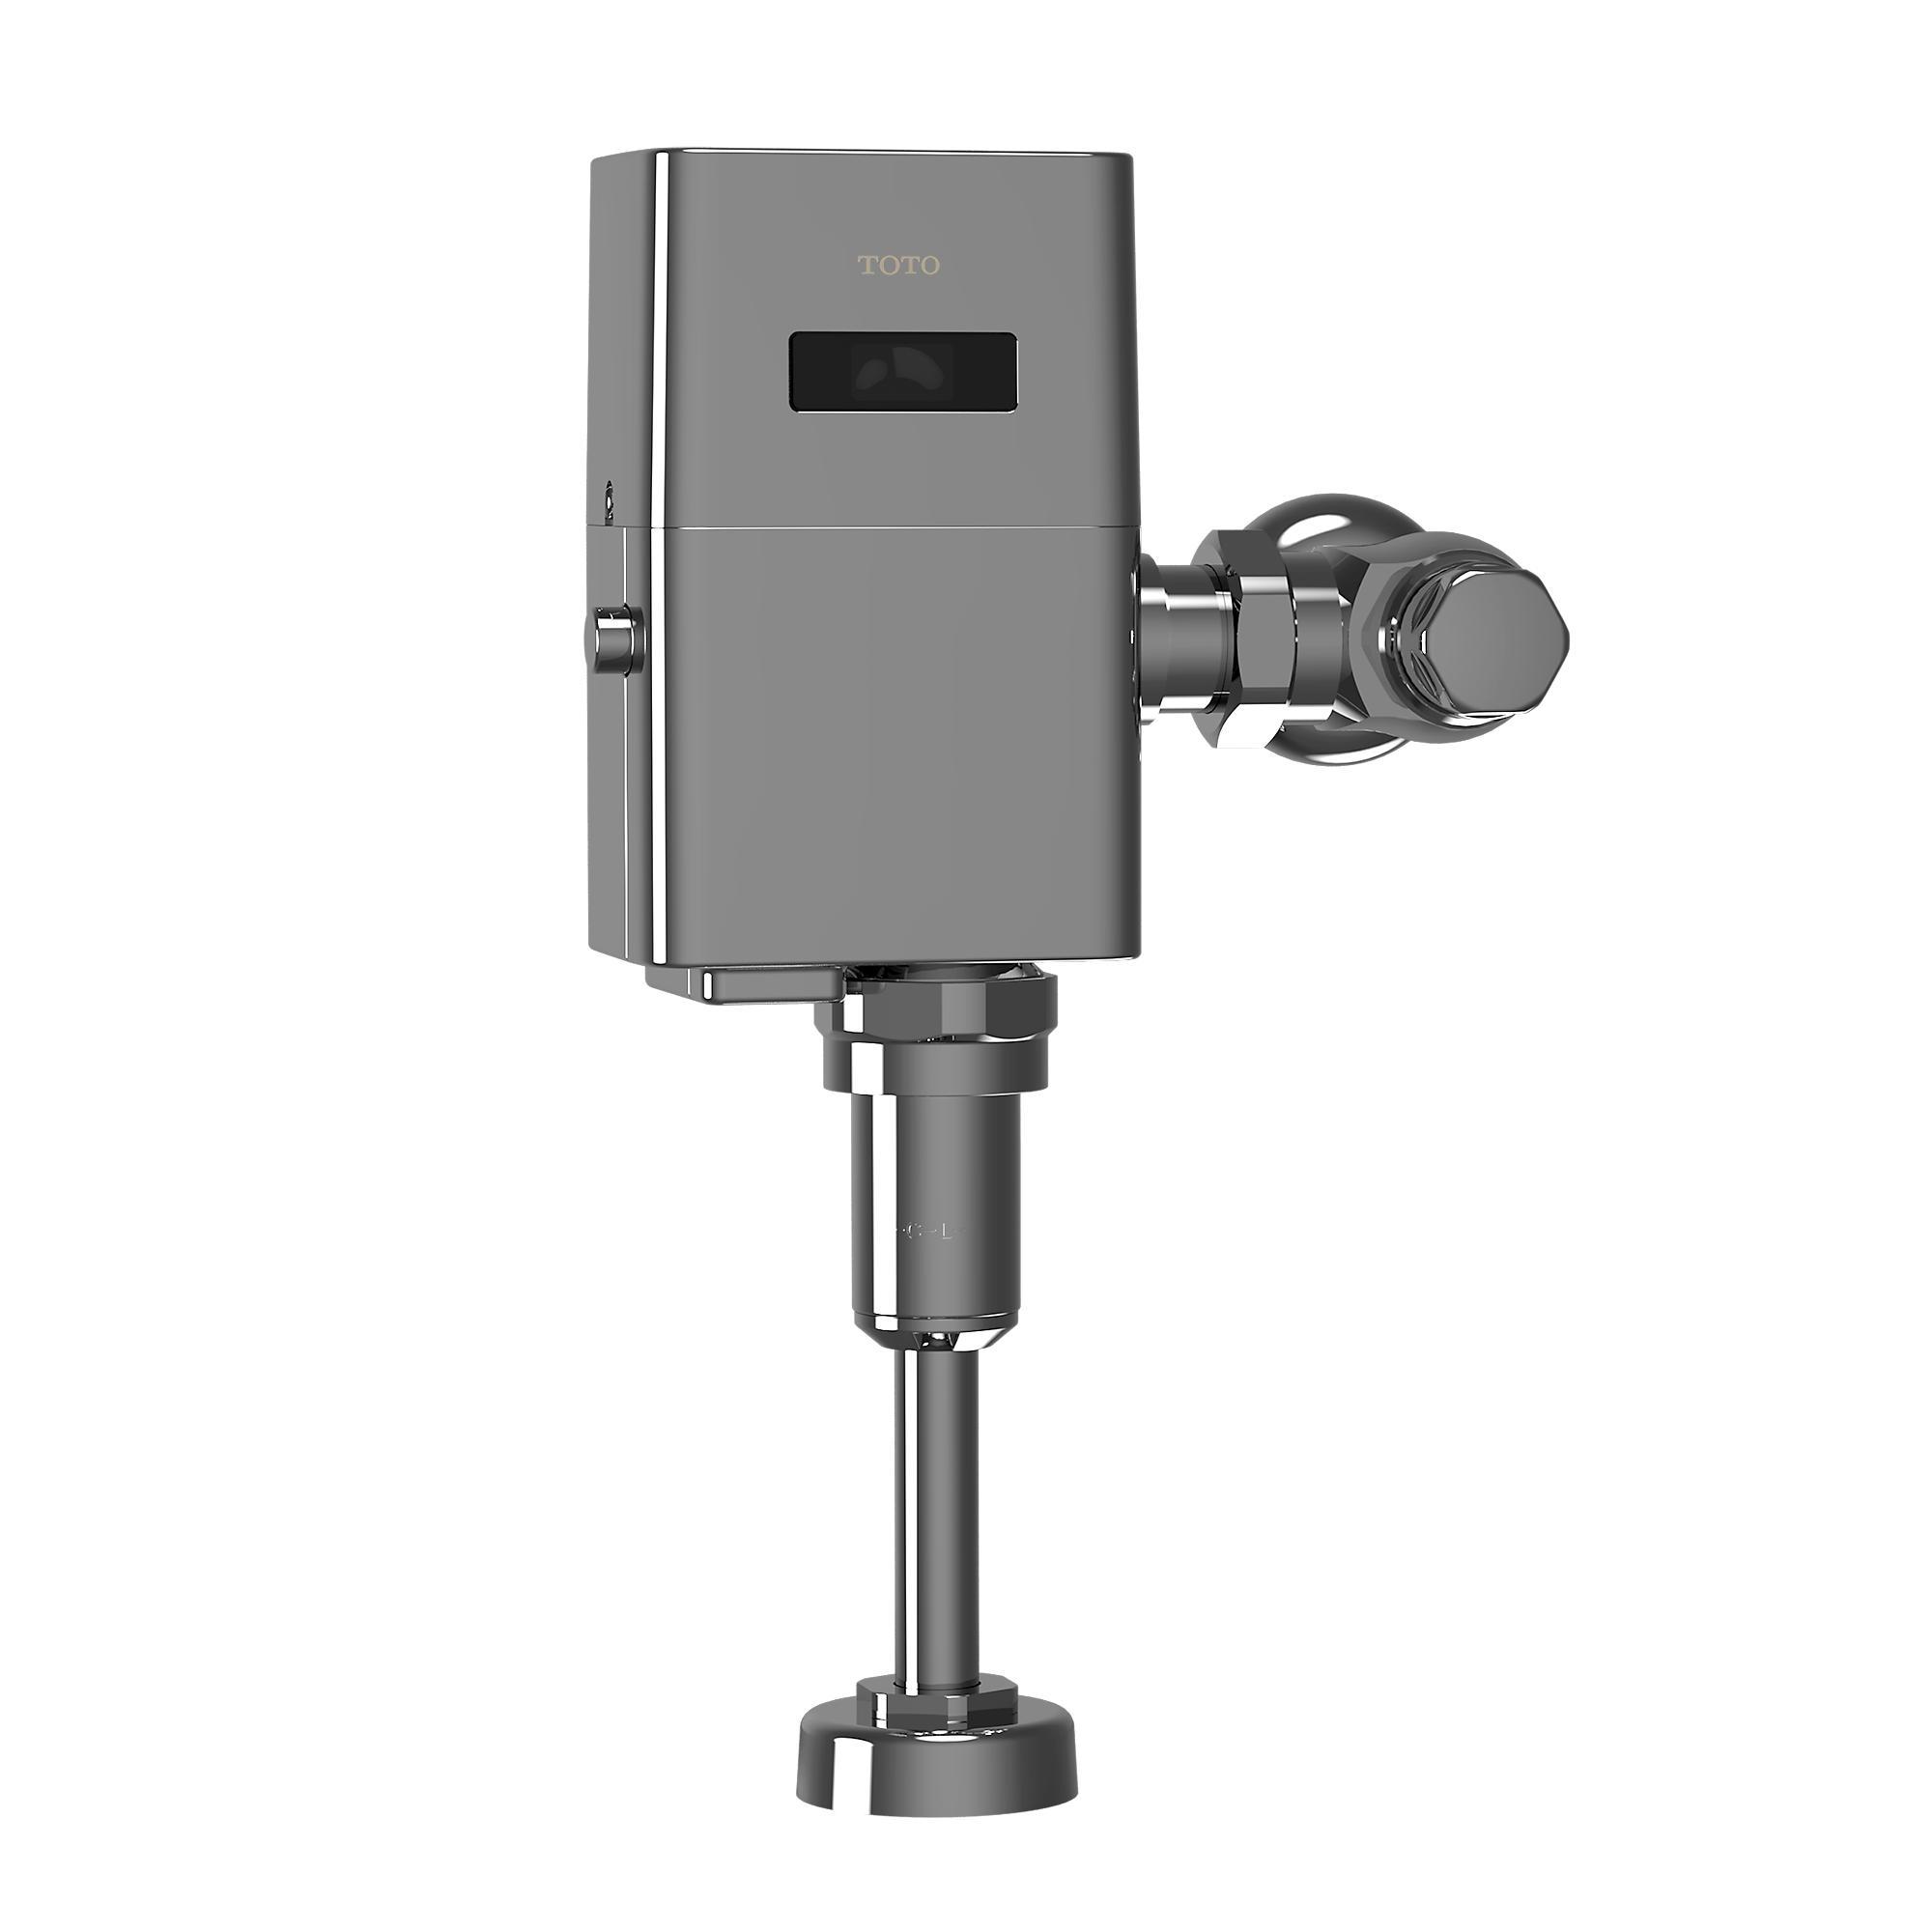 Teu1la22 cp ecopower  high efficiency urinal flush valve   0 5 gpf  1 1 4  v b  set  0